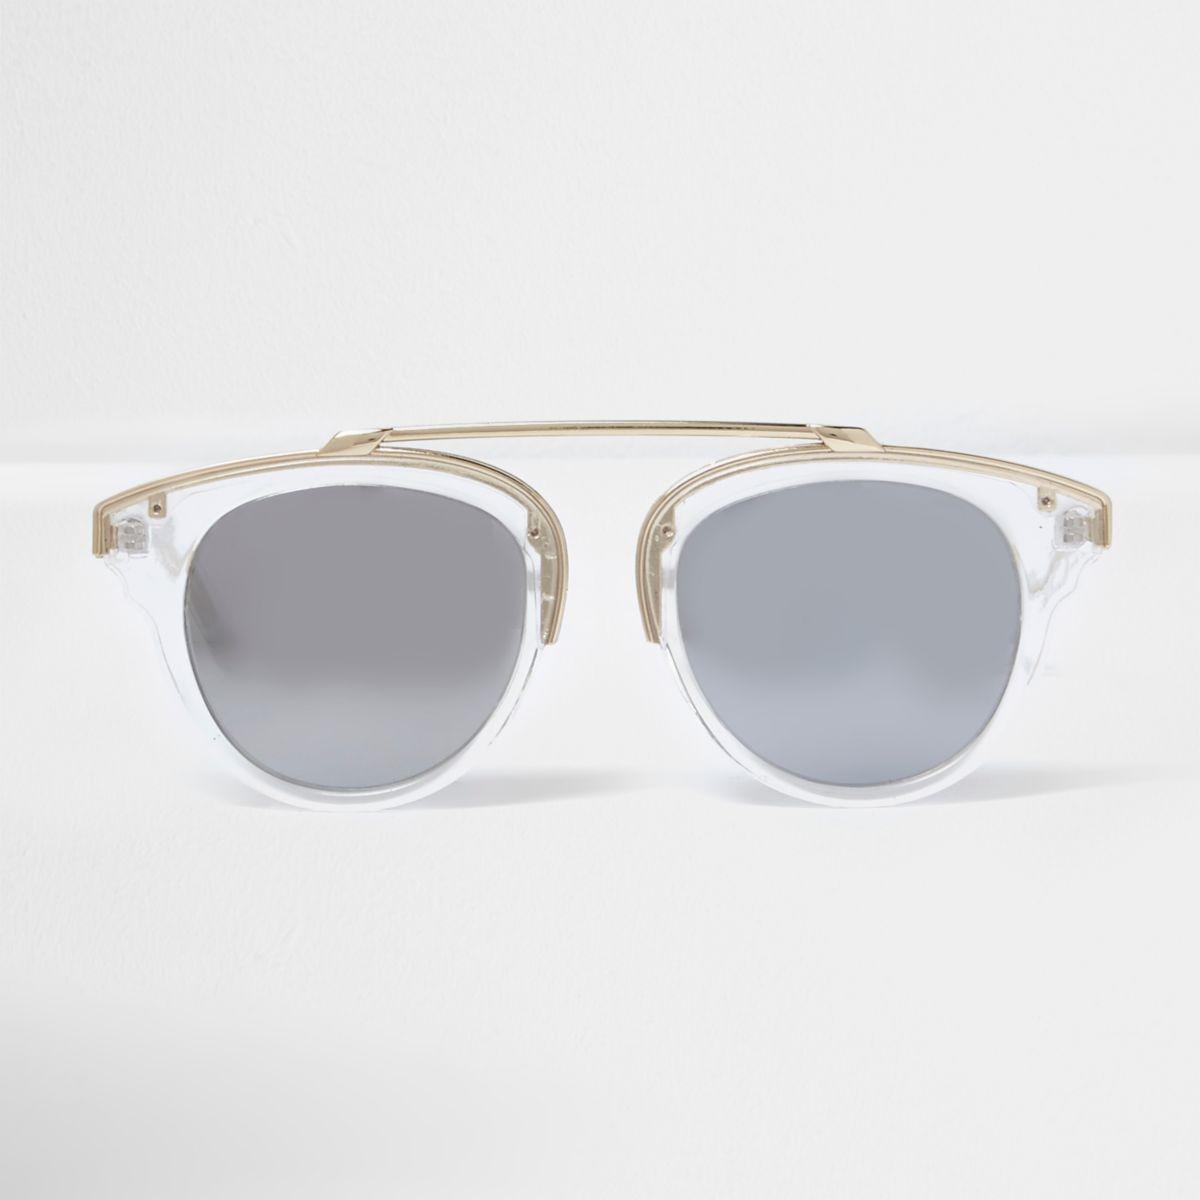 Clear silver mirror lens sunglasses